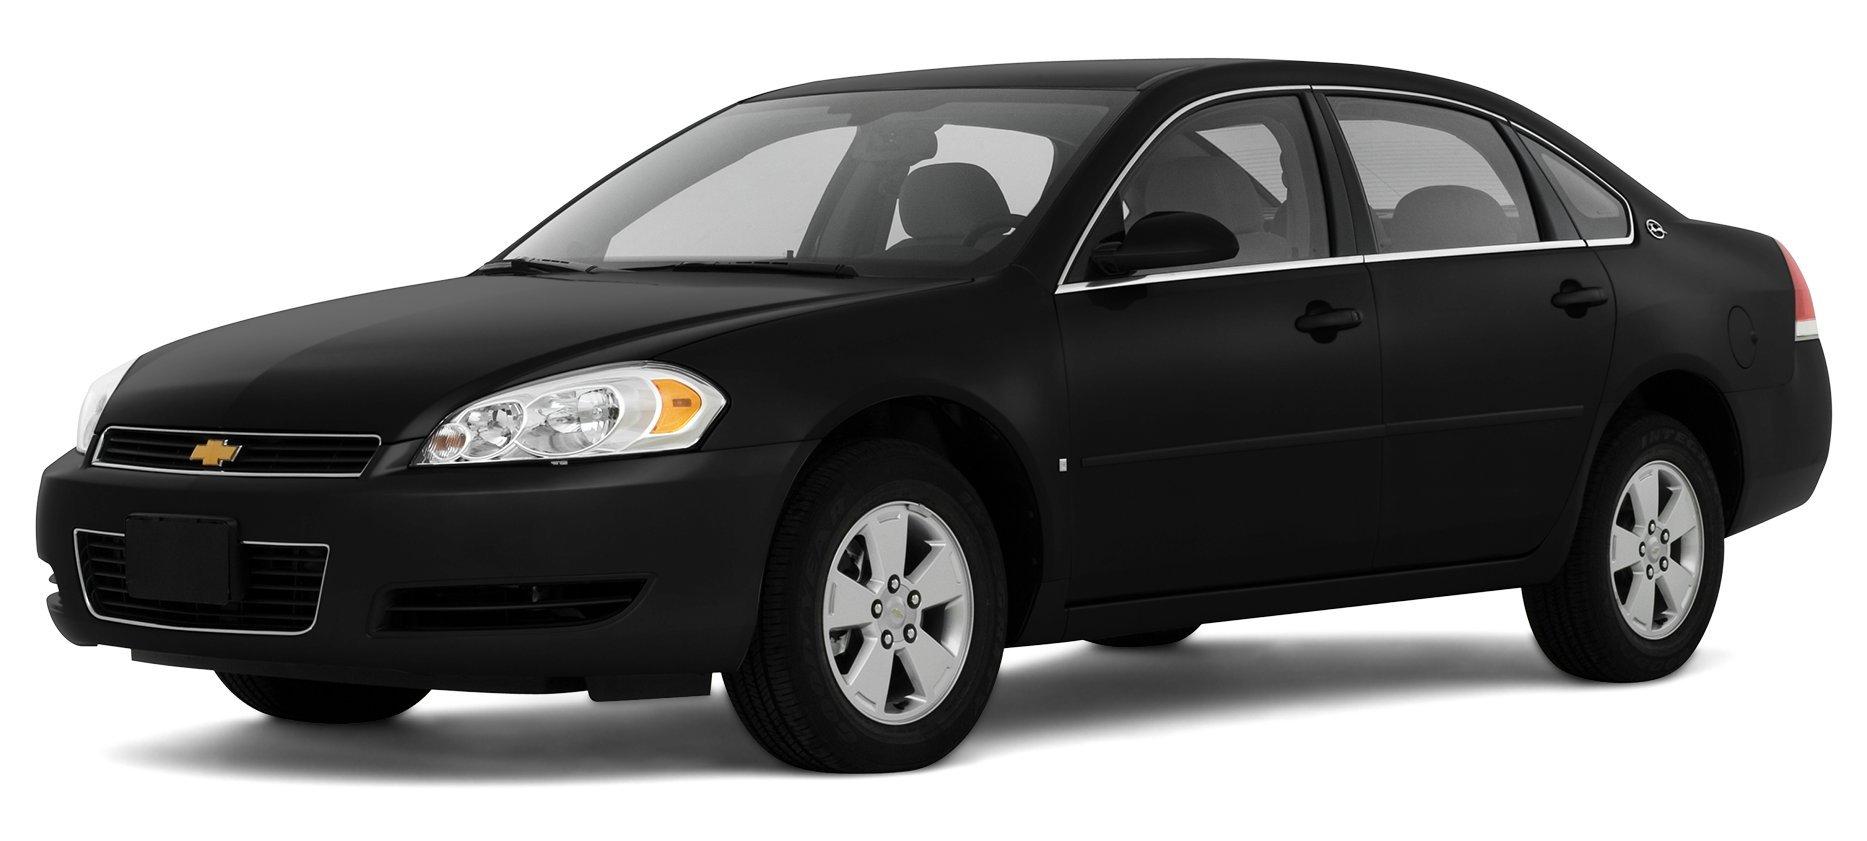 2008 Chevrolet Impala LS, 4 Door Sedan ...